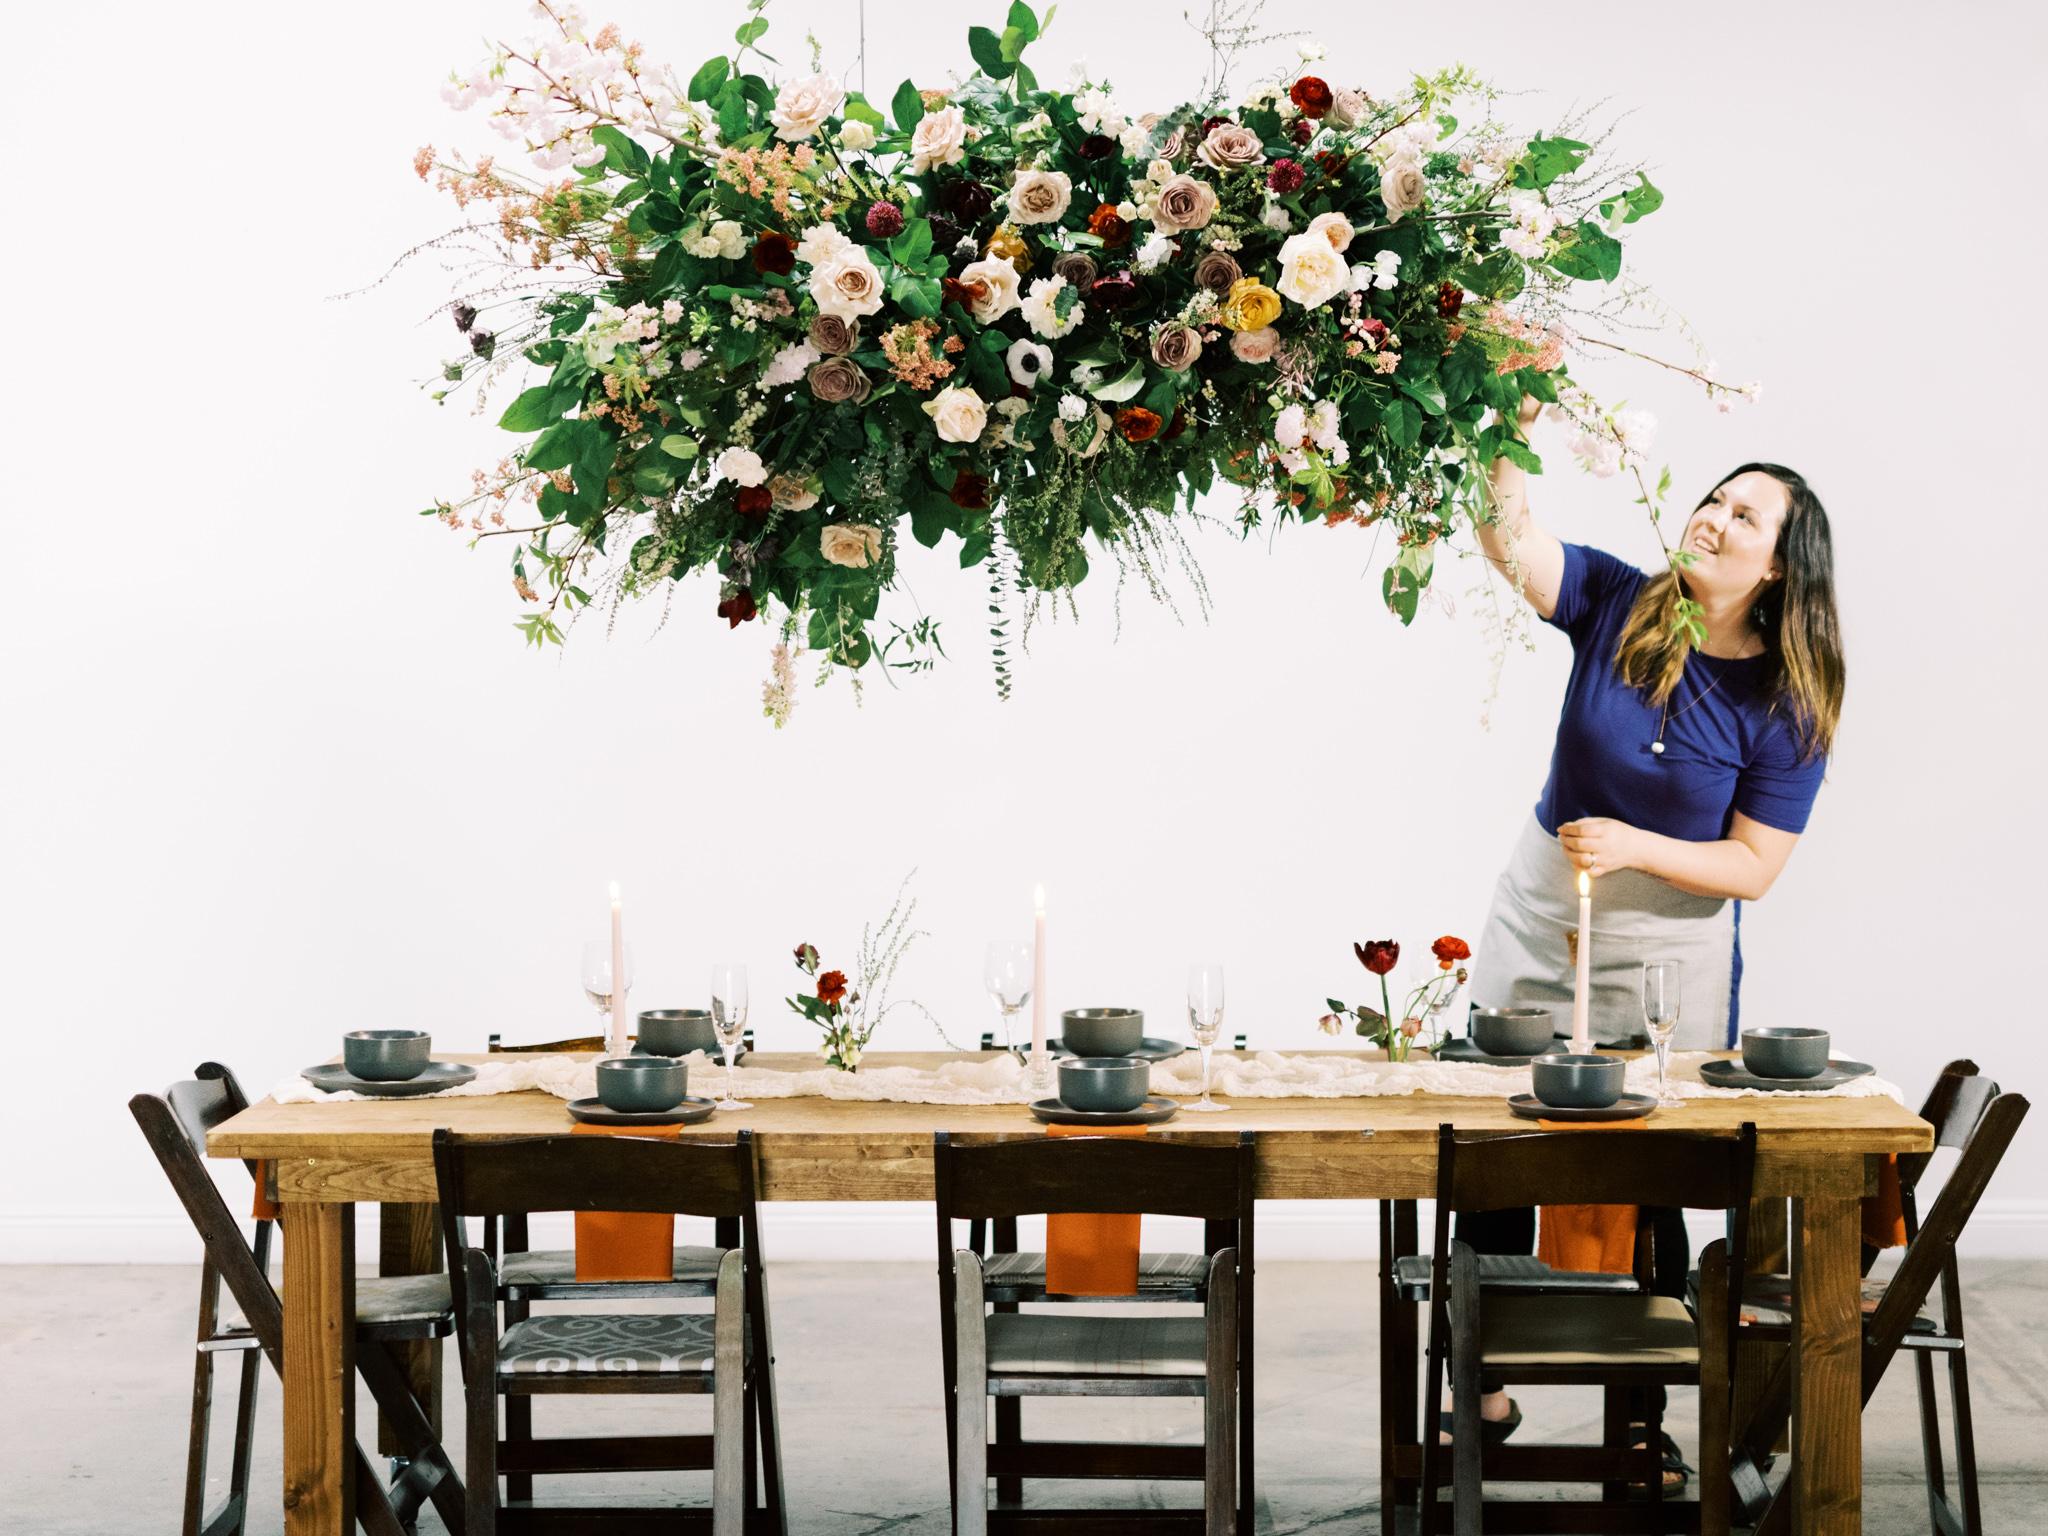 Cultivate Goods Floral Workshop - The Doyle - Kristen Krehbiel - Kristen Kay Photography-192.jpg